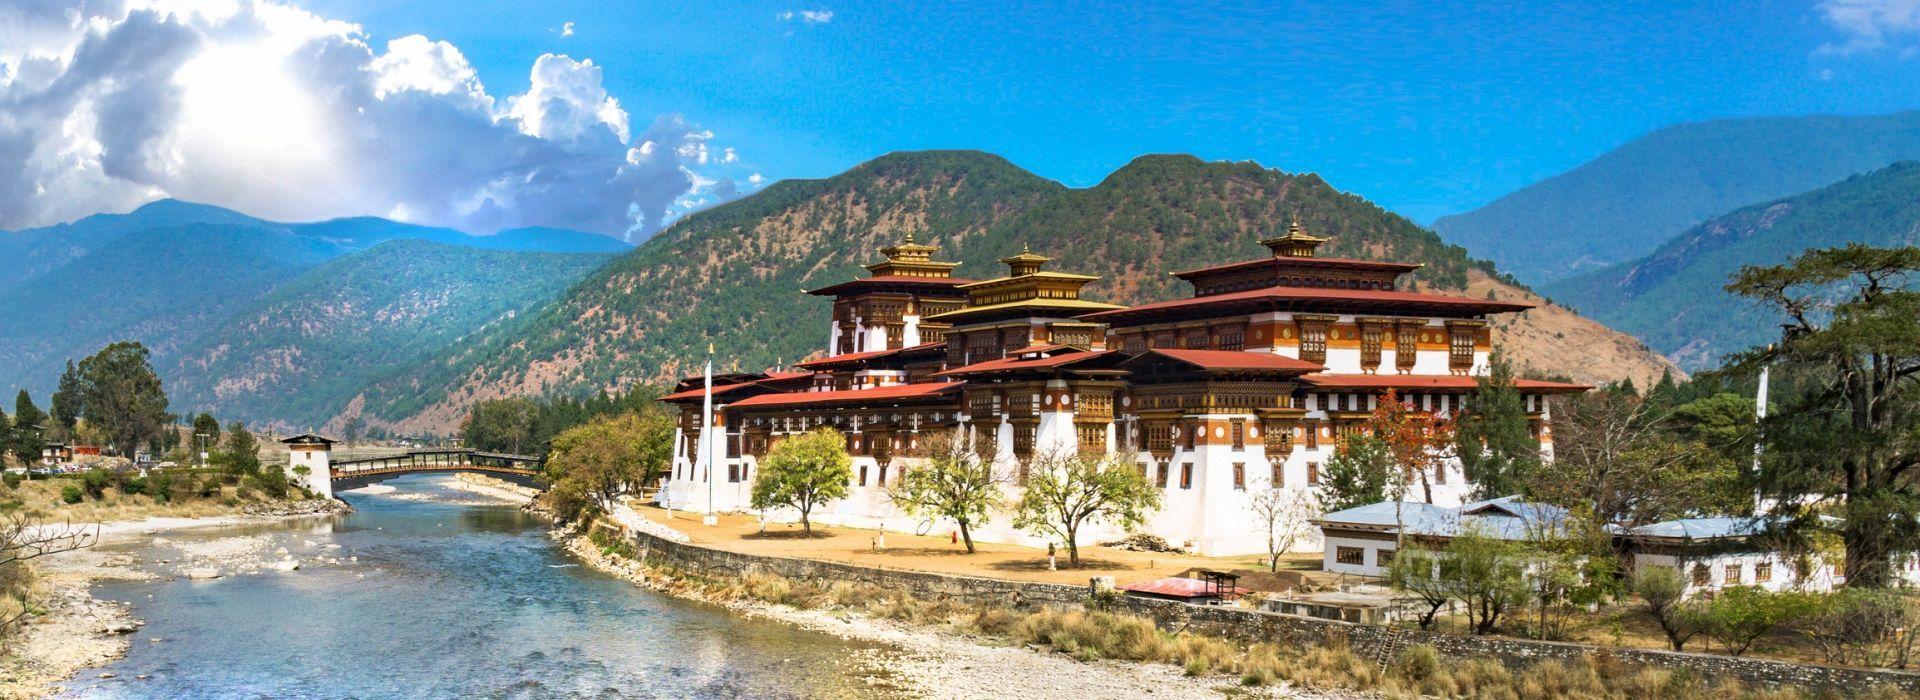 Mountain flights Tours in Bhutan